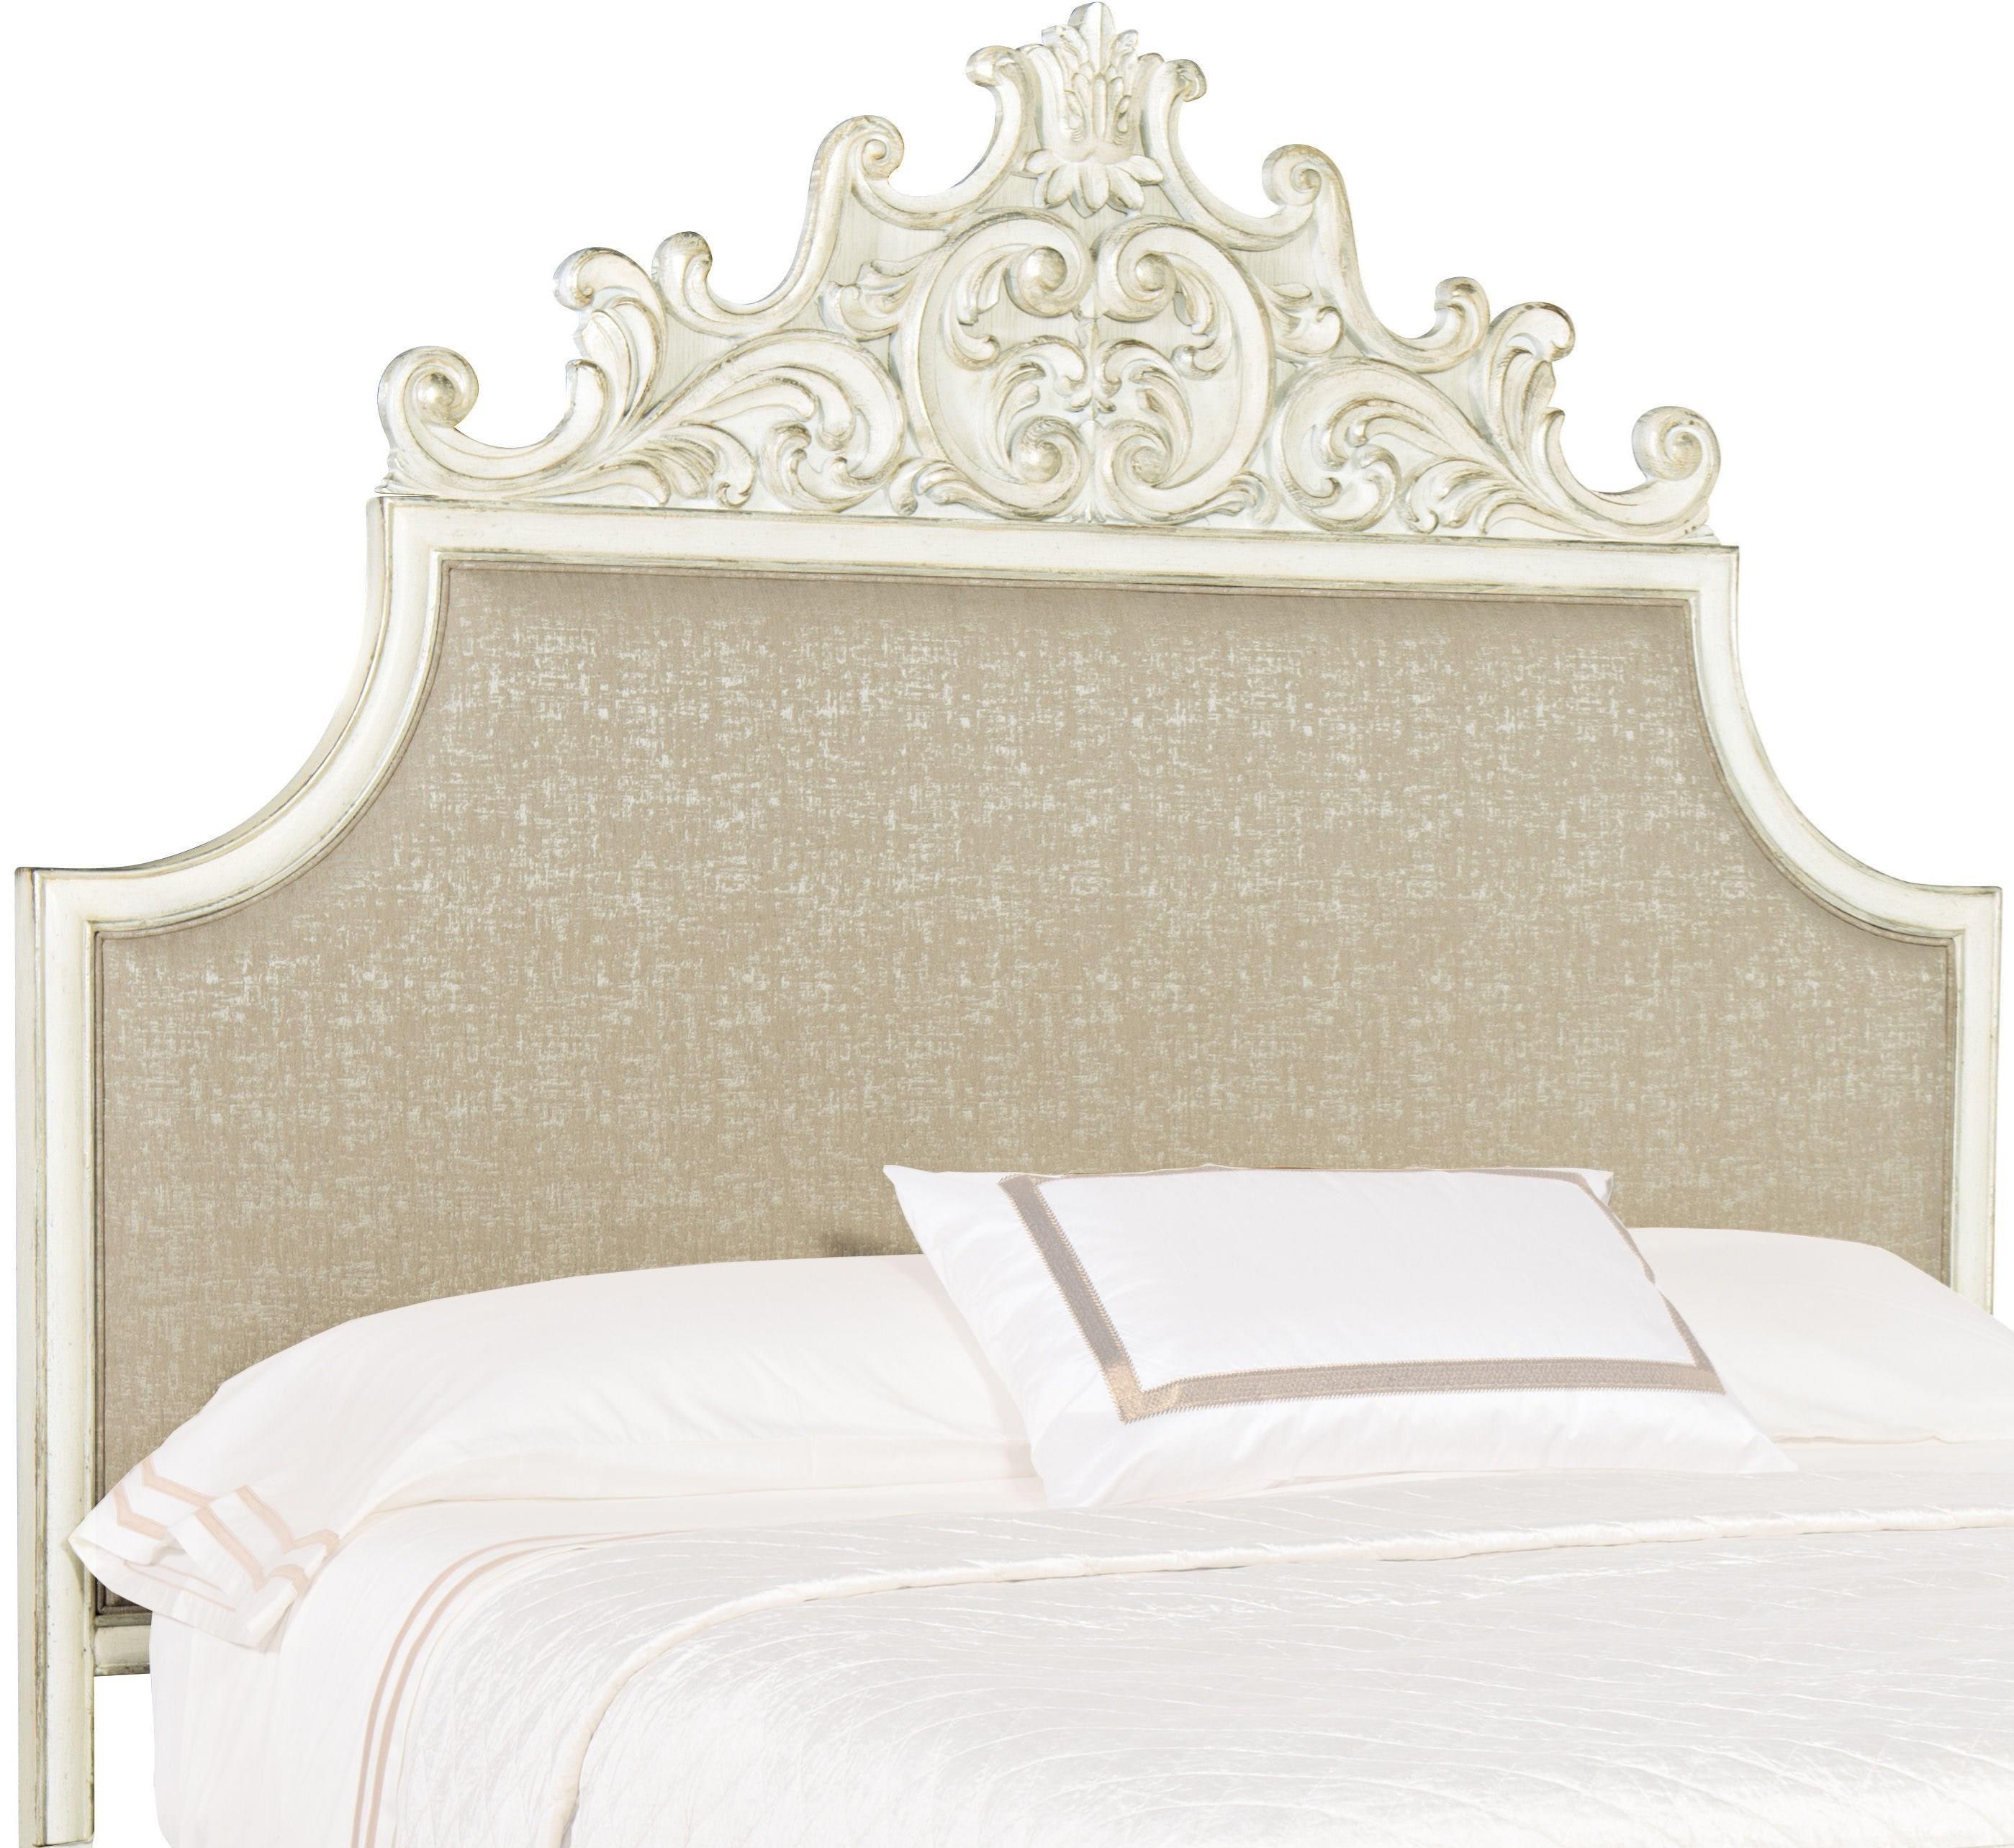 Sanctuary Anastasie Queen Upholstered Headboard by Hooker Furniture at Baer's Furniture